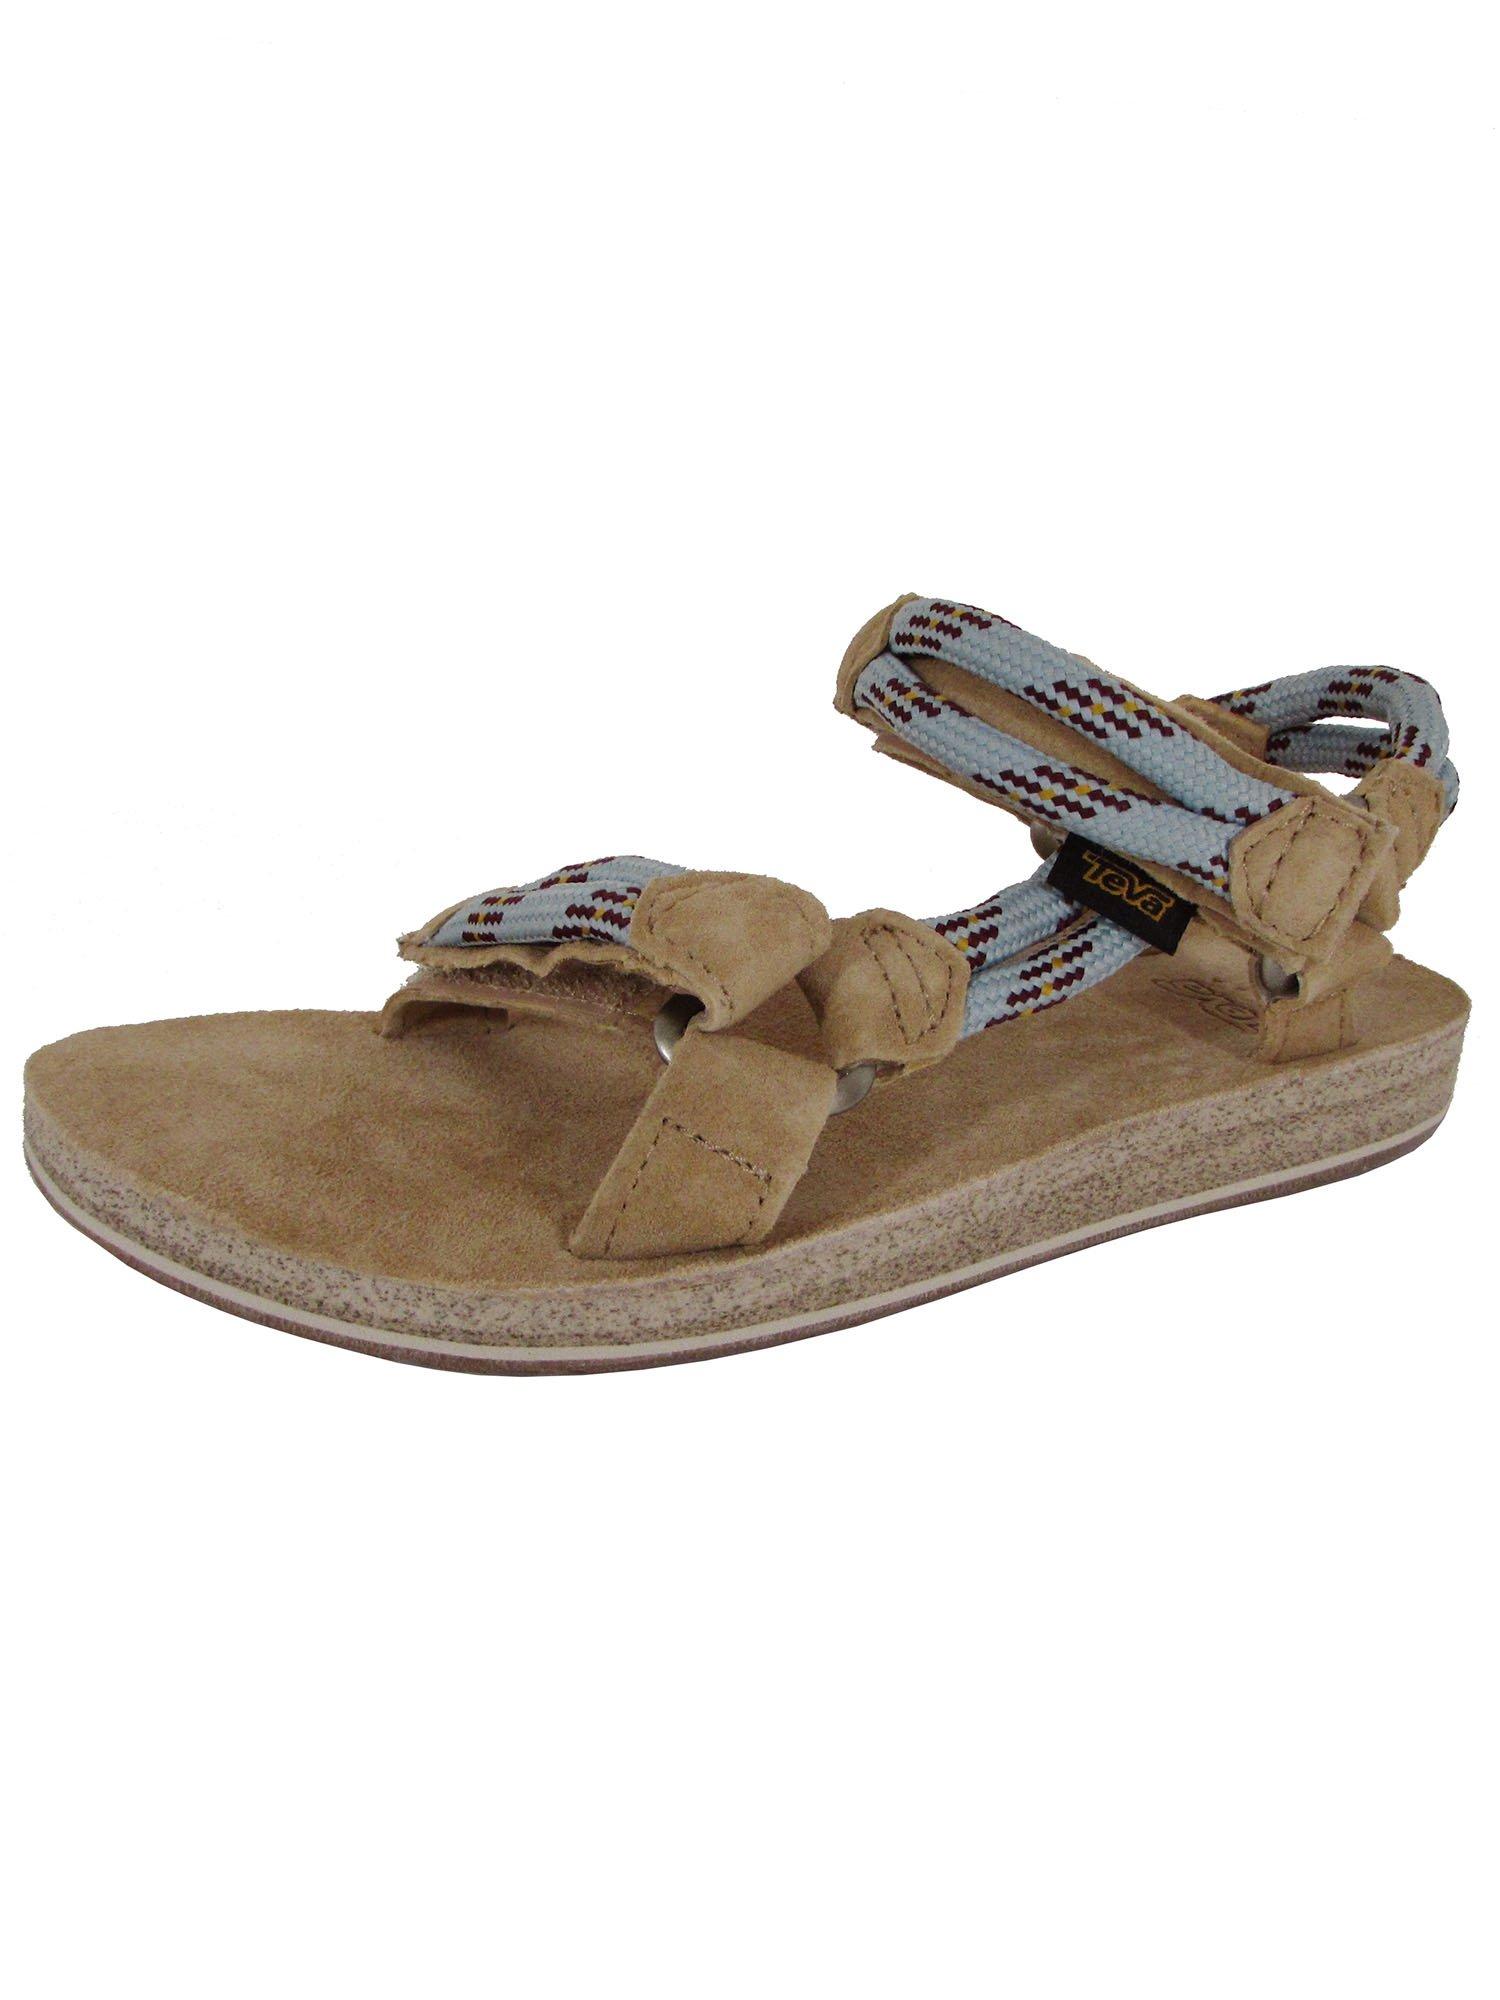 Teva Womens Original Universal Rope Sport Sandal Shoes, Canal Blue, US 5